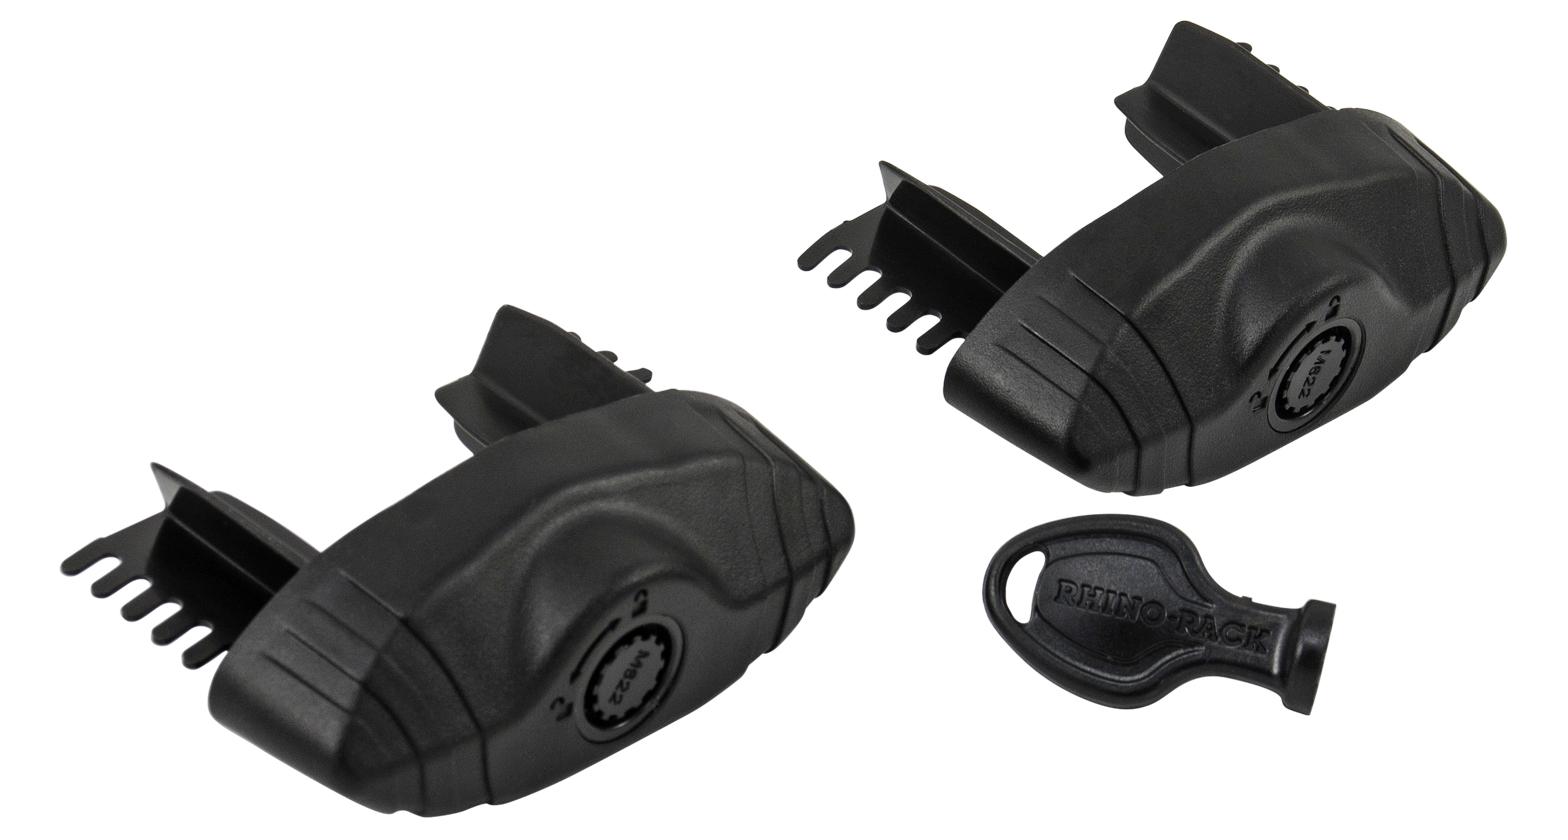 Vortex Secure Core Locking End Caps (x2)